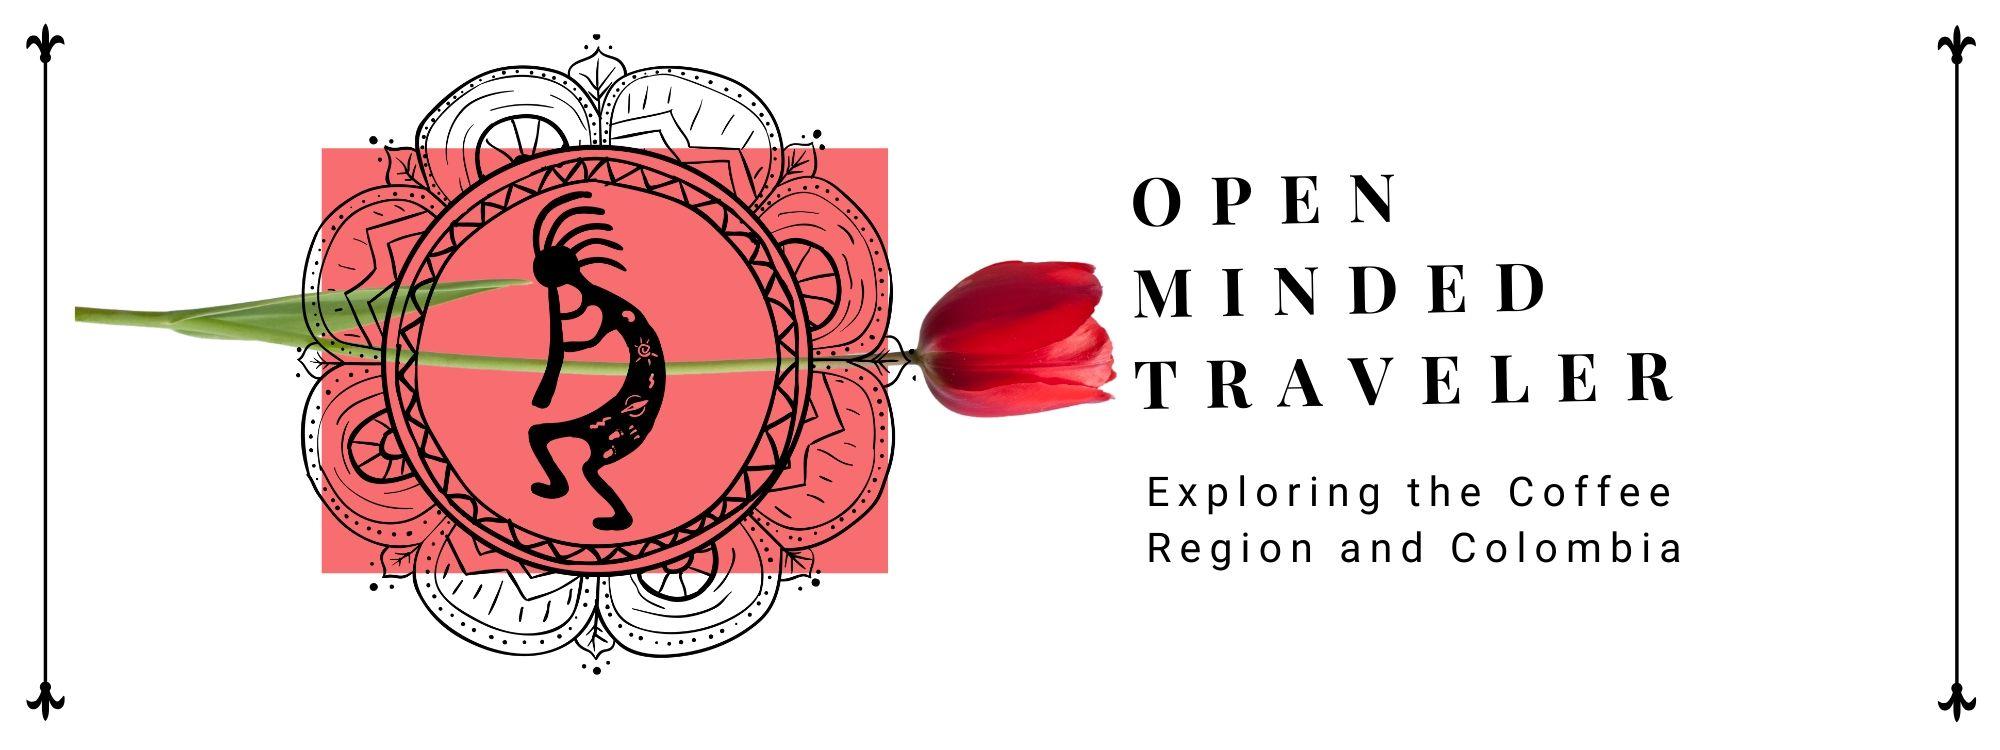 Open Minded Traveler